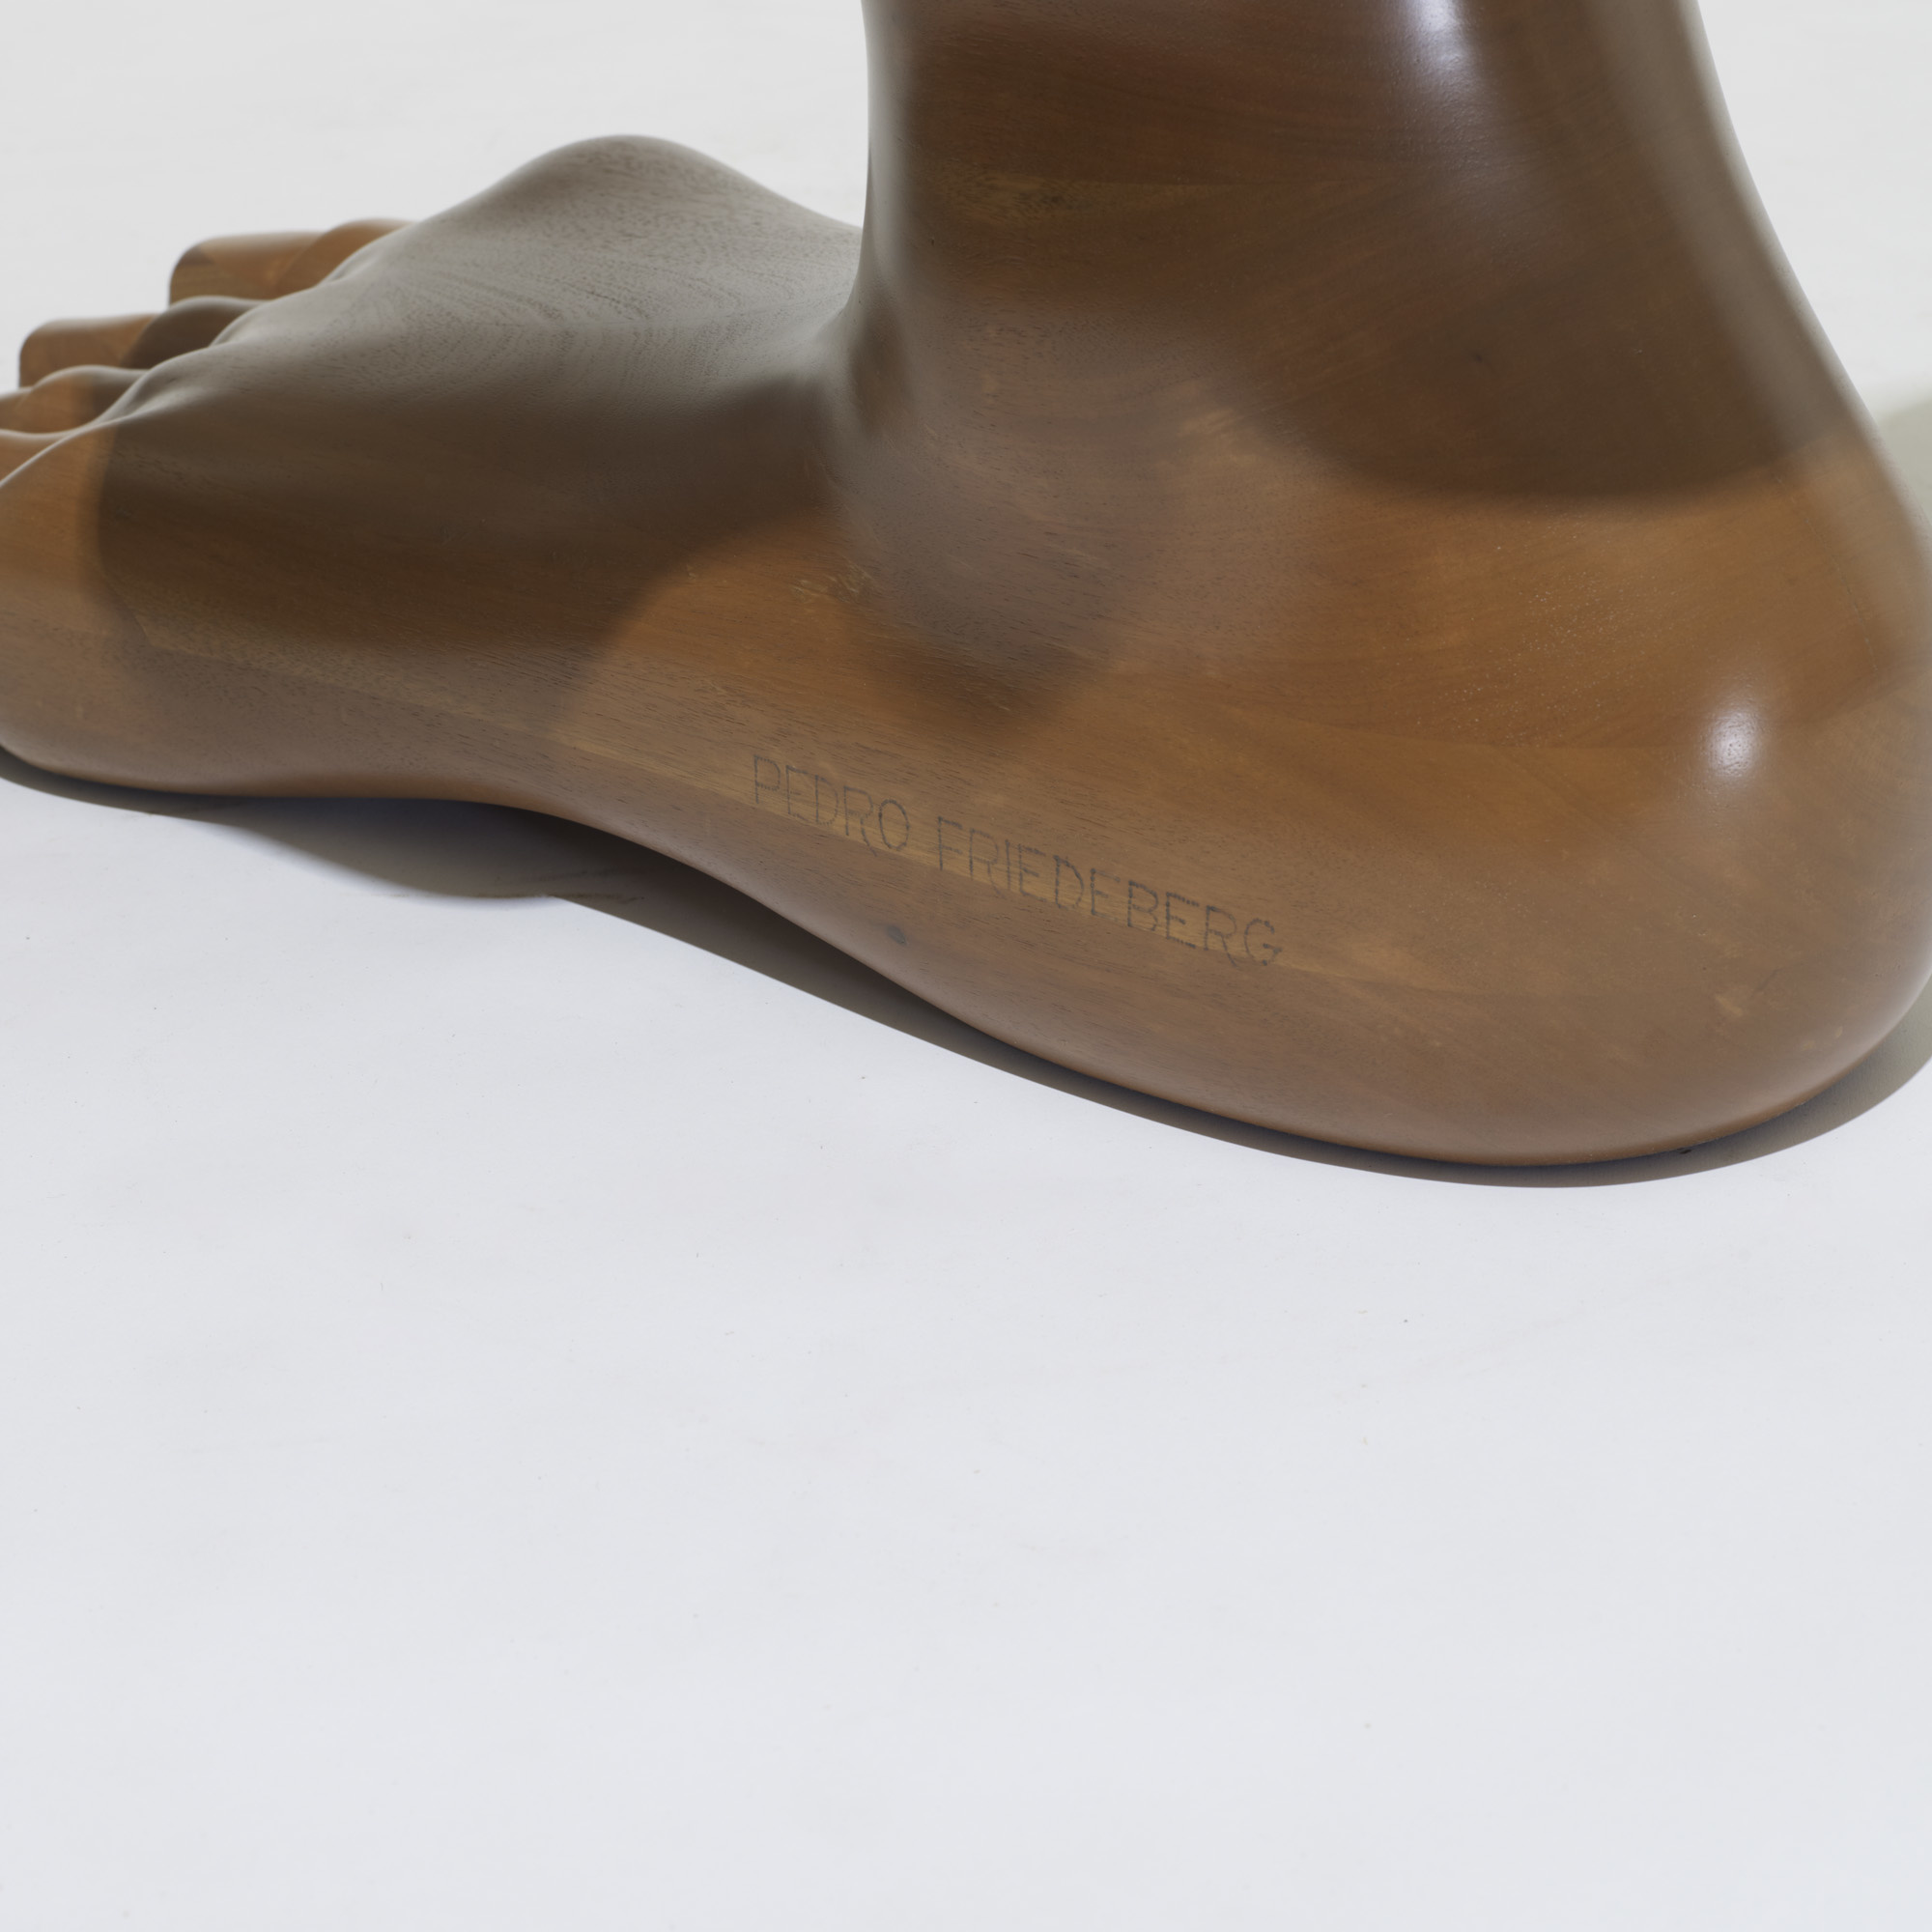 246: PEDRO FRIEDEBERG, Hand Foot chair \u003c Modern Design, 29 March ...